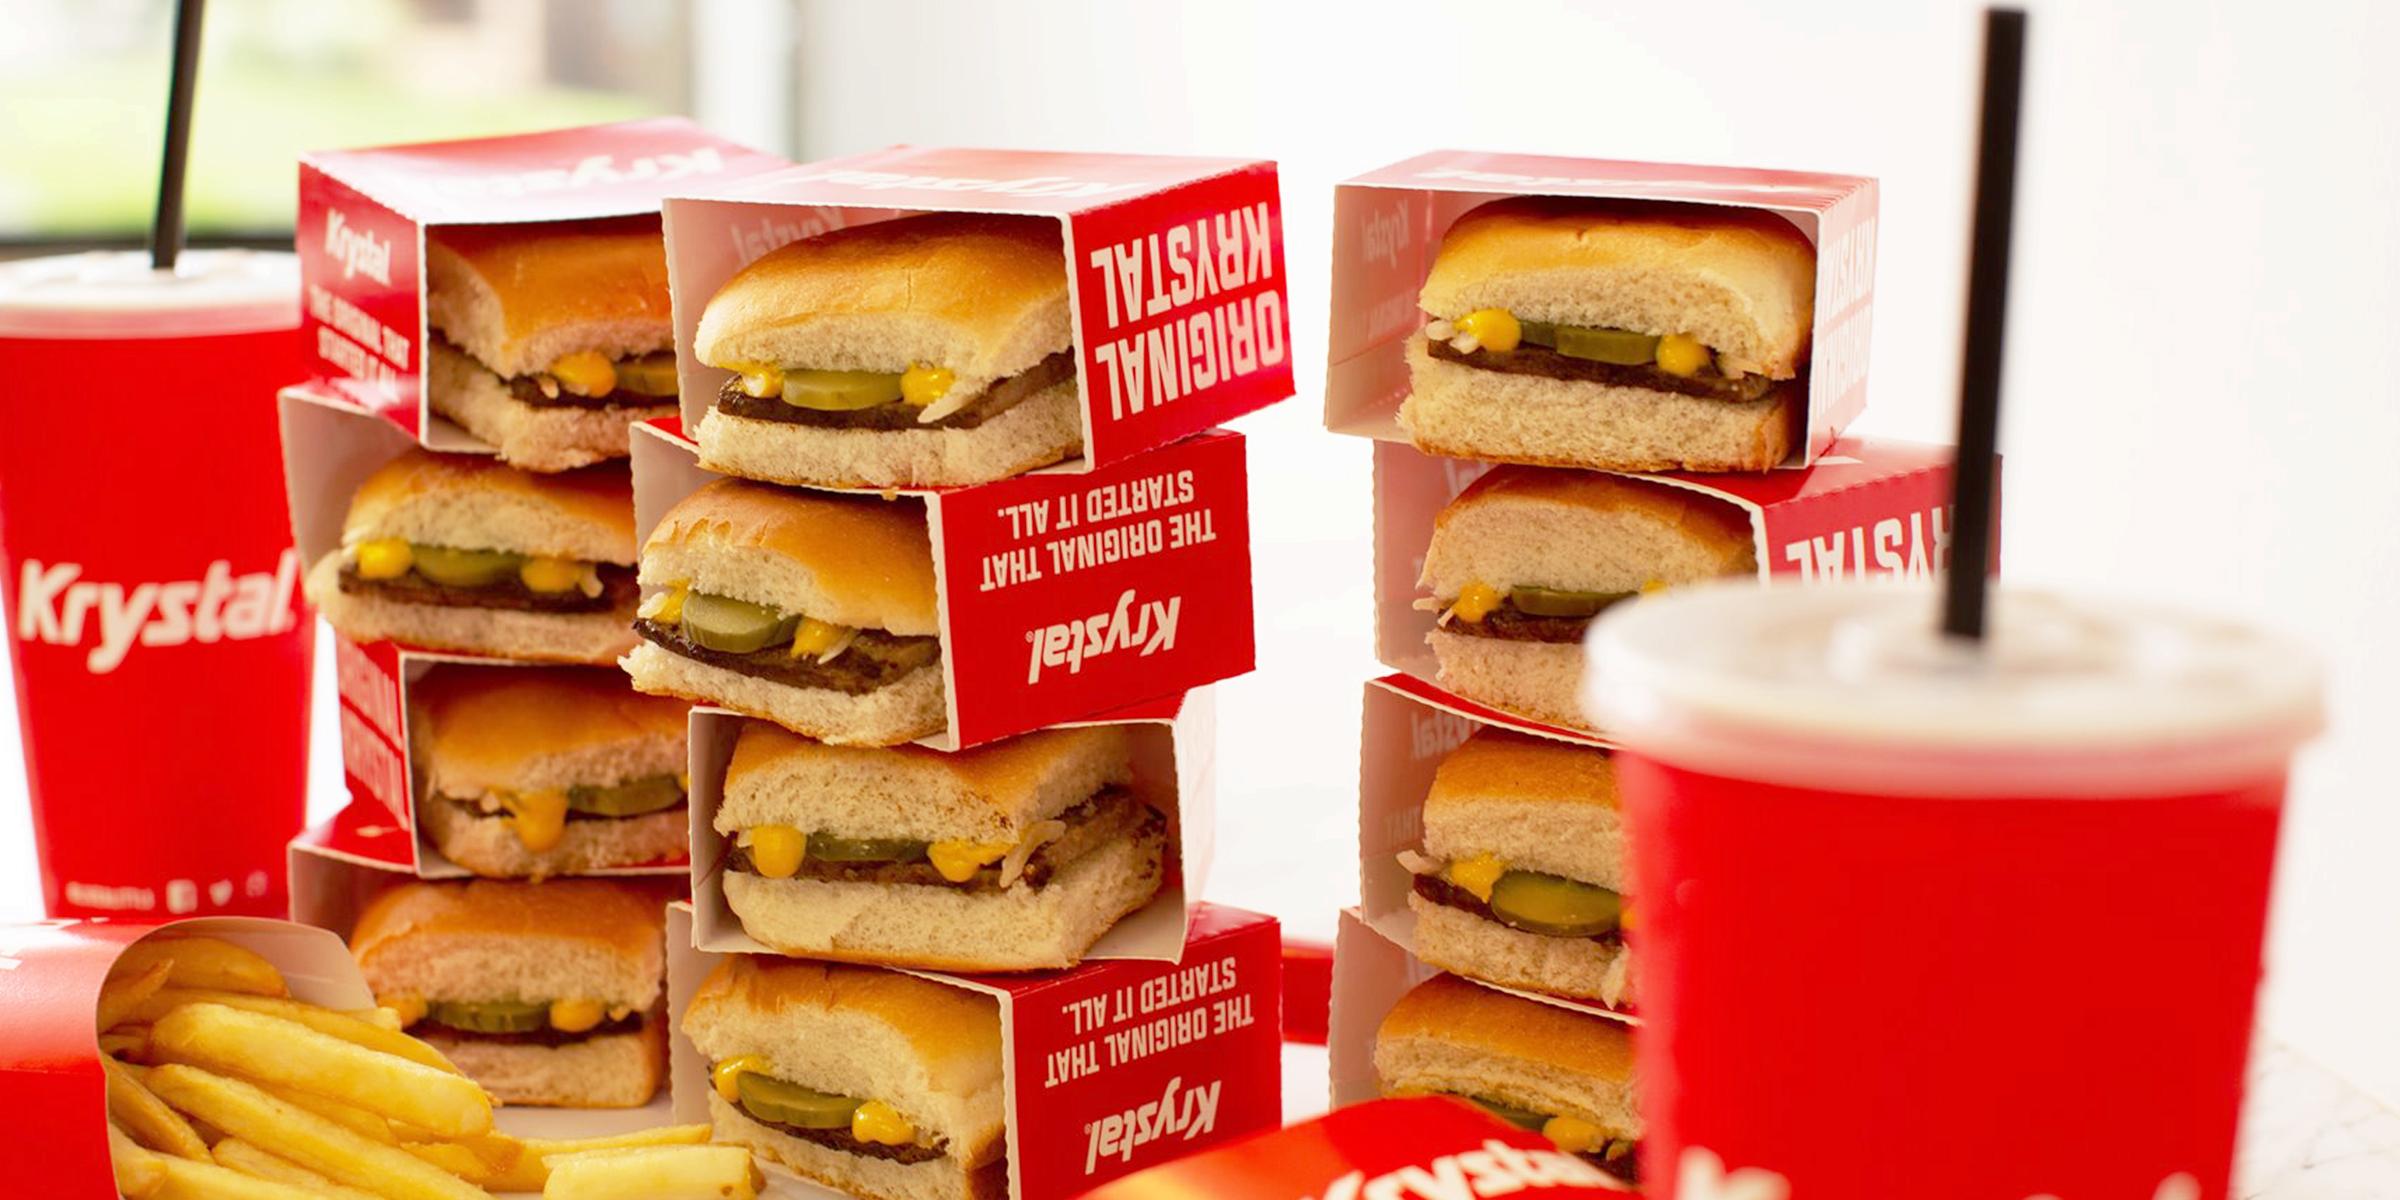 Image result for krystal's hamburgers